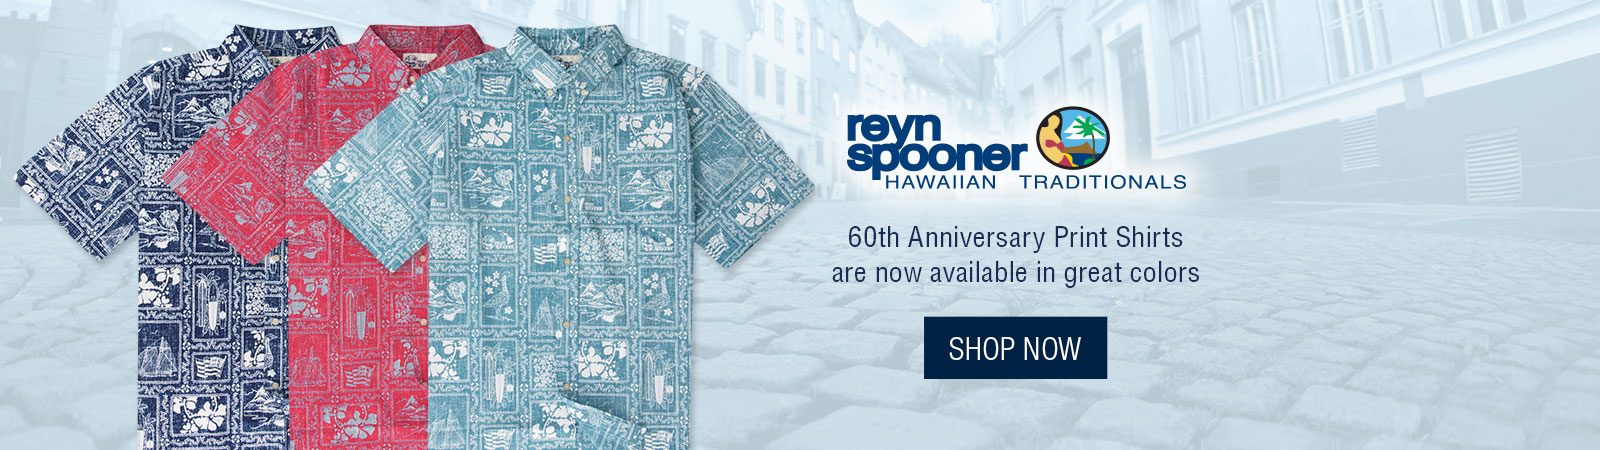 Reyn Spooner - Shop Print Shirts